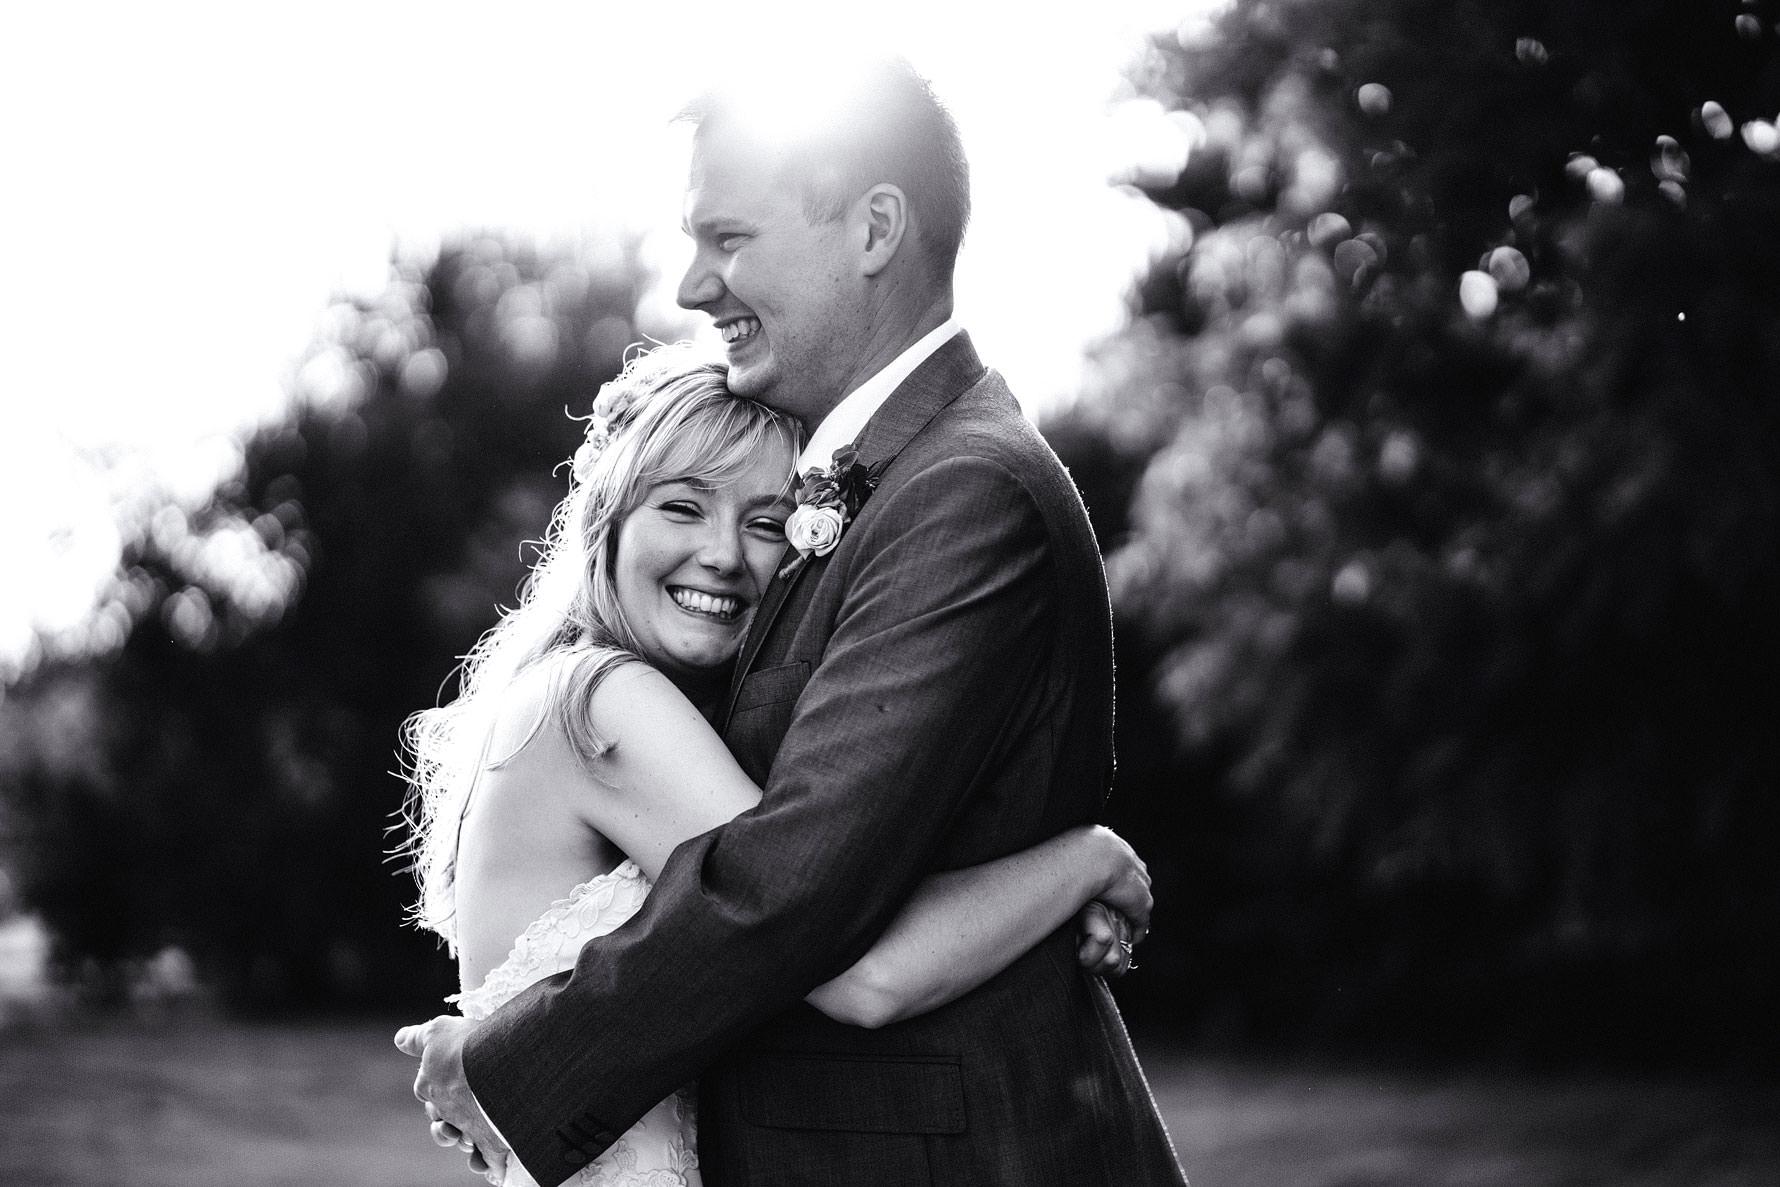 a happy couple embrace